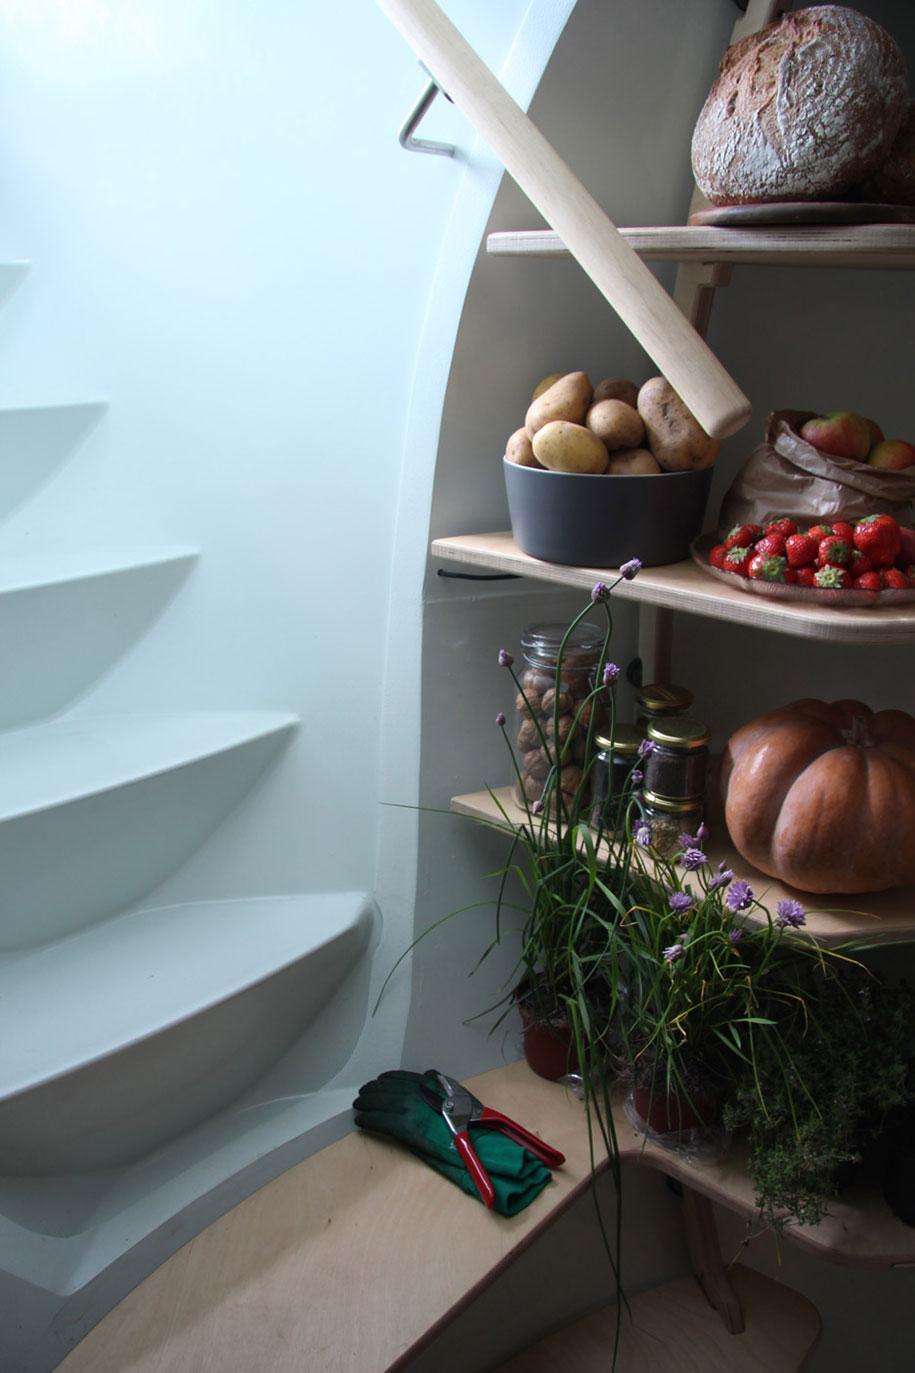 root-cellar-cold-storage-no-electricity-groundfridge-floris-shoonderbeek-weltevree-11